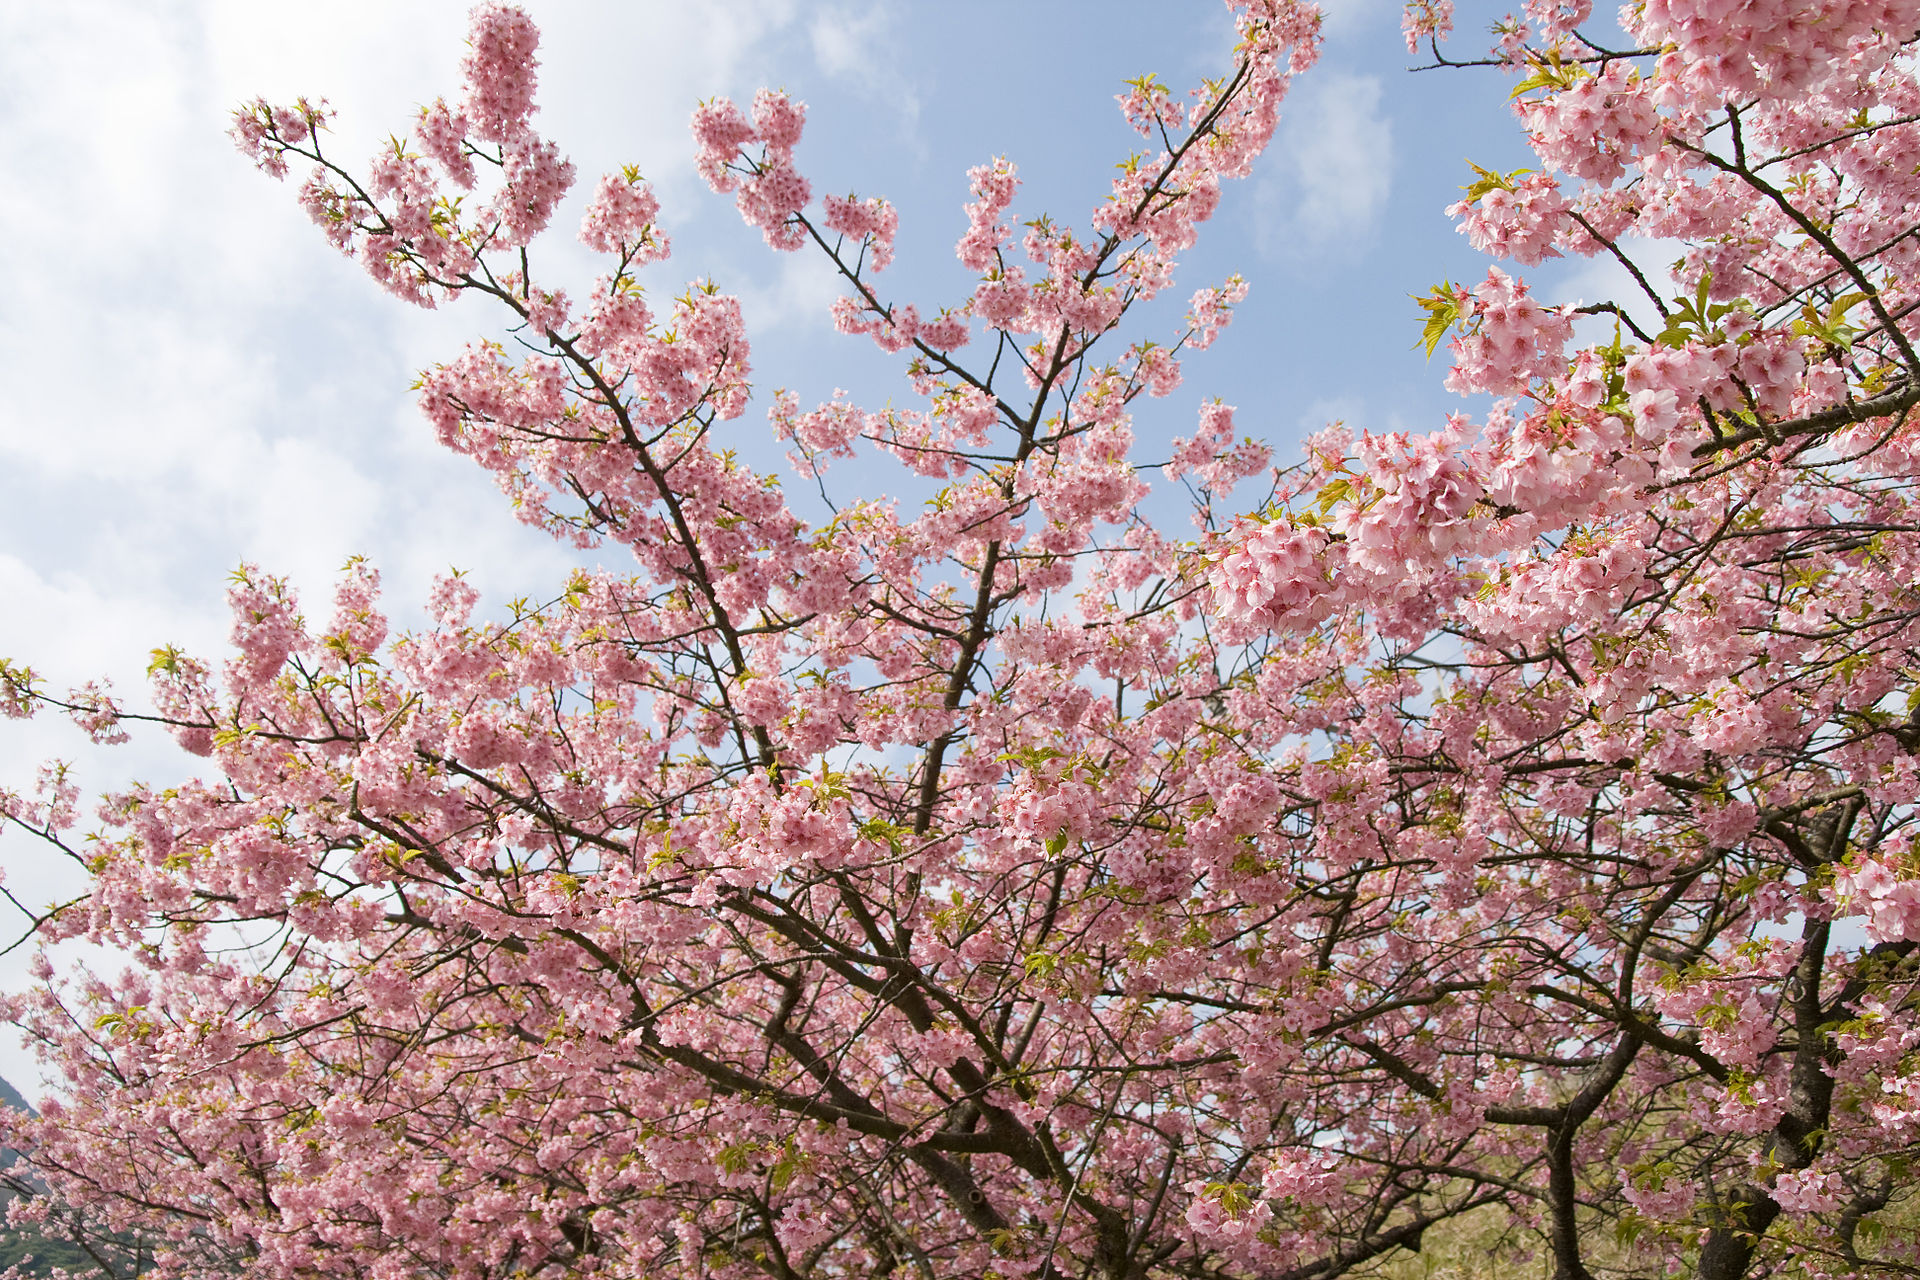 https://upload.wikimedia.org/wikipedia/commons/thumb/5/5e/Prunus_lannesiana_cv._Kawazu-zakura_05.jpg/1920px-Prunus_lannesiana_cv._Kawazu-zakura_05.jpg